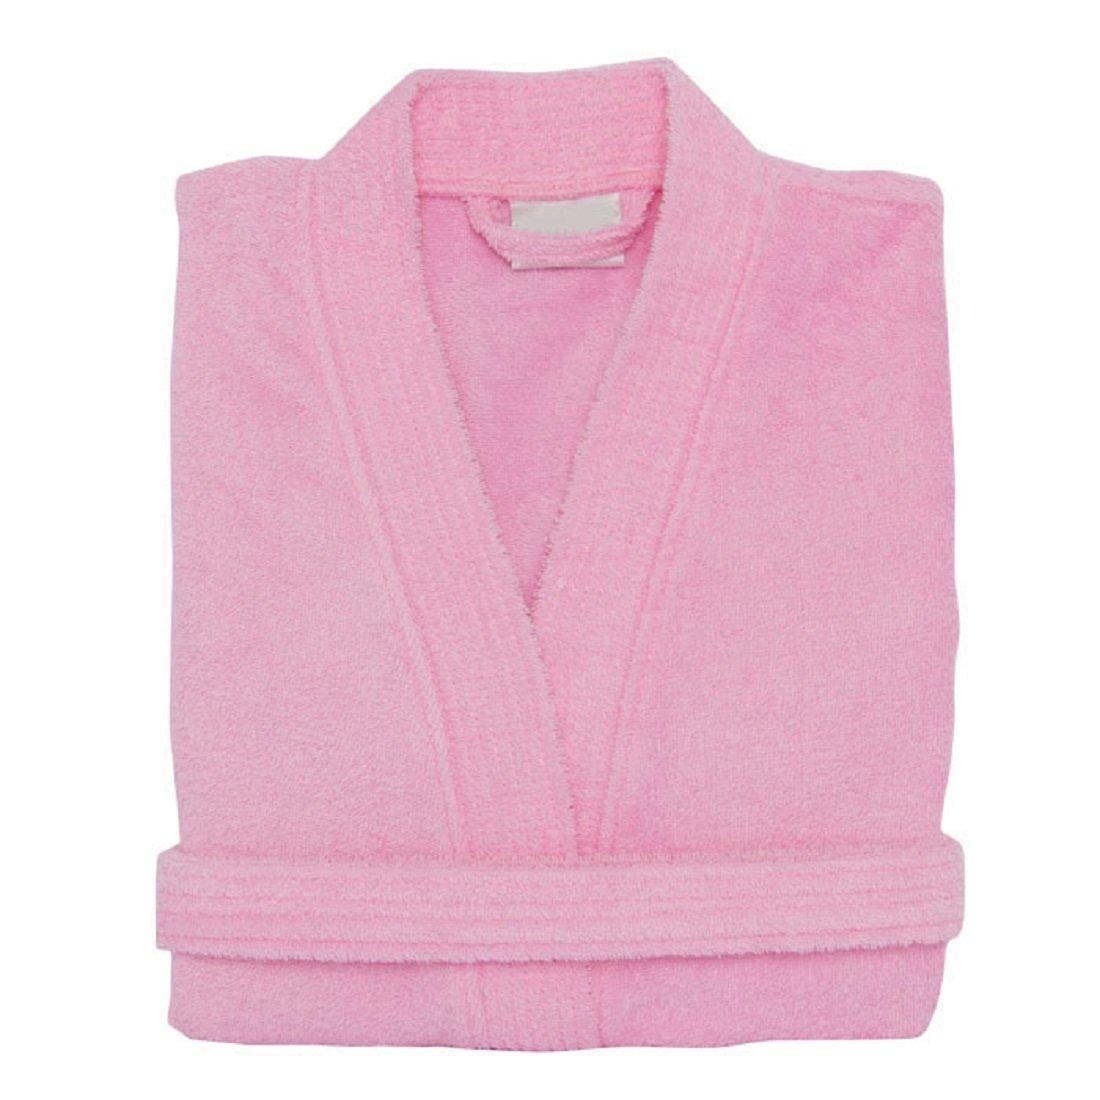 Mirko Terry Cloth Bathrobe/%100 Cotton Mens Womens Robe Best Gift for Her